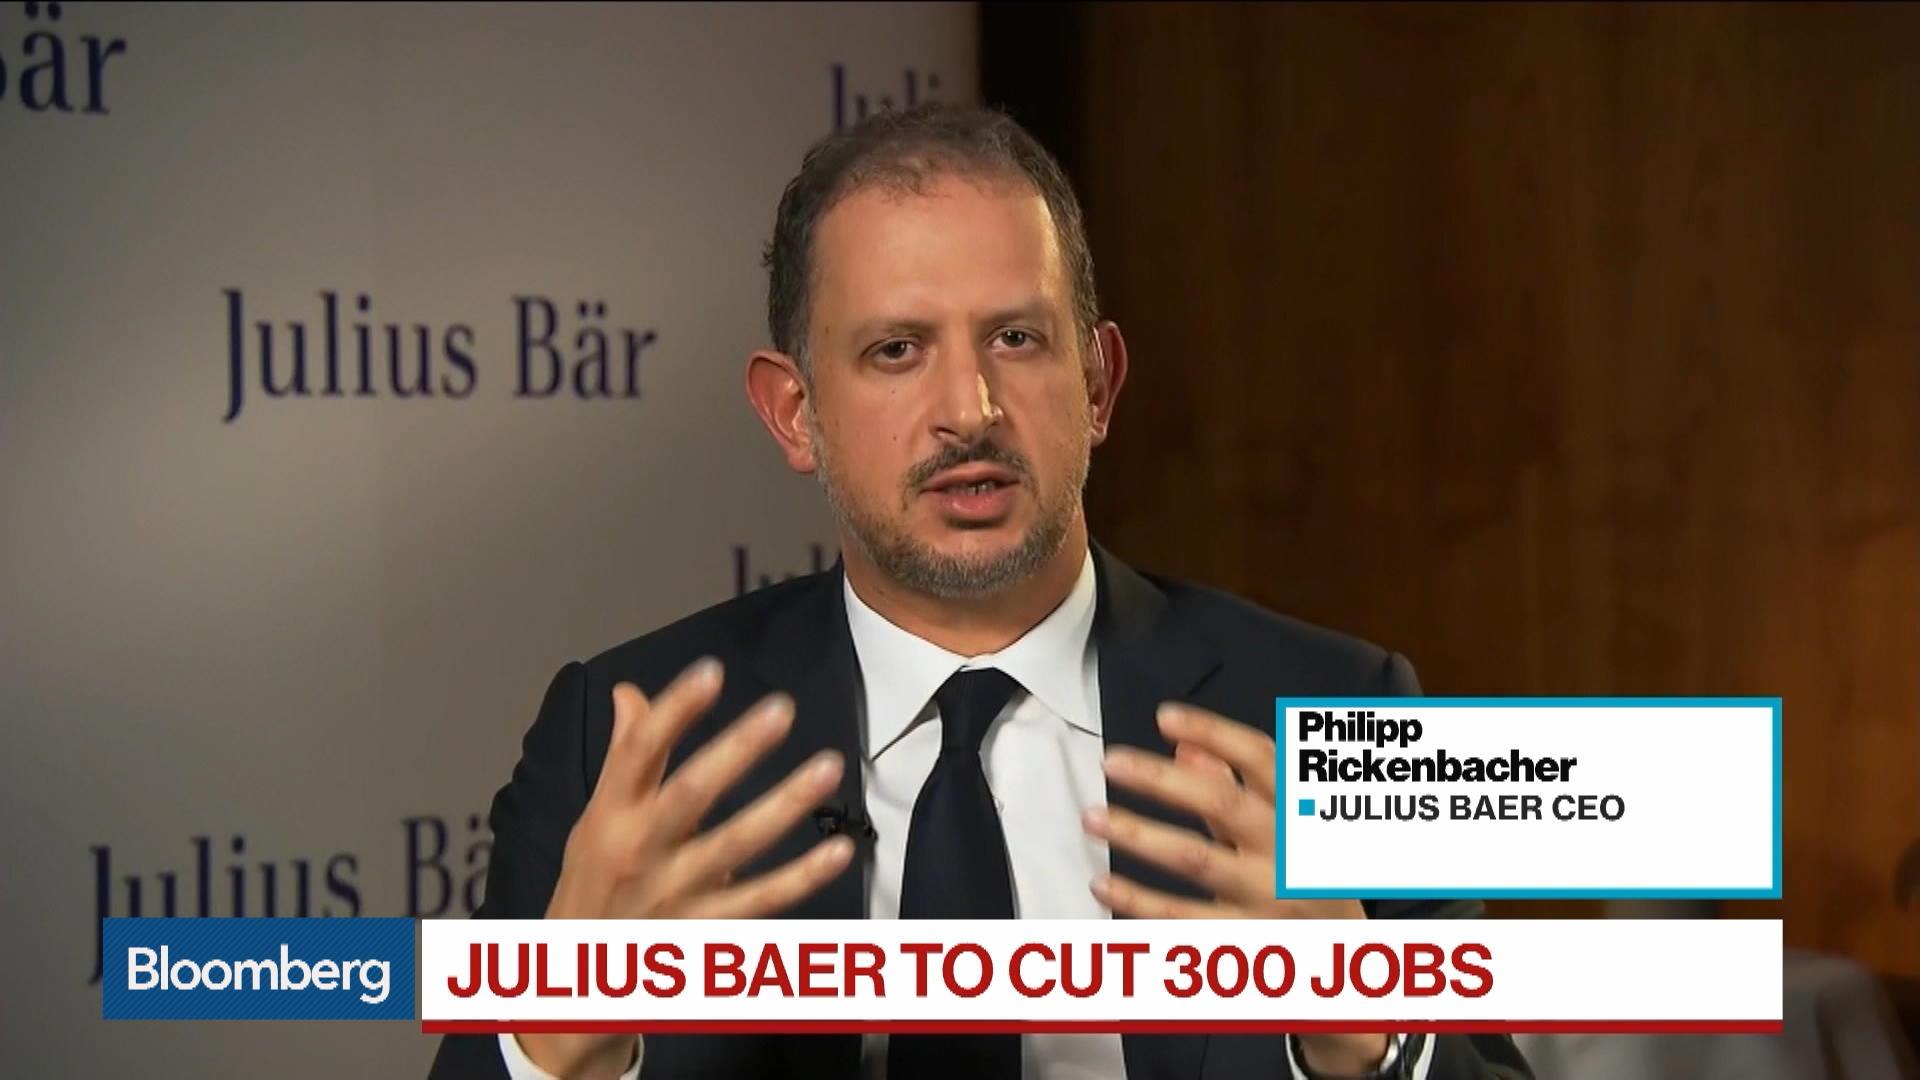 Julius Baer Ceo Philipp Rickenbacher To Cut 300 Jobs In Push For